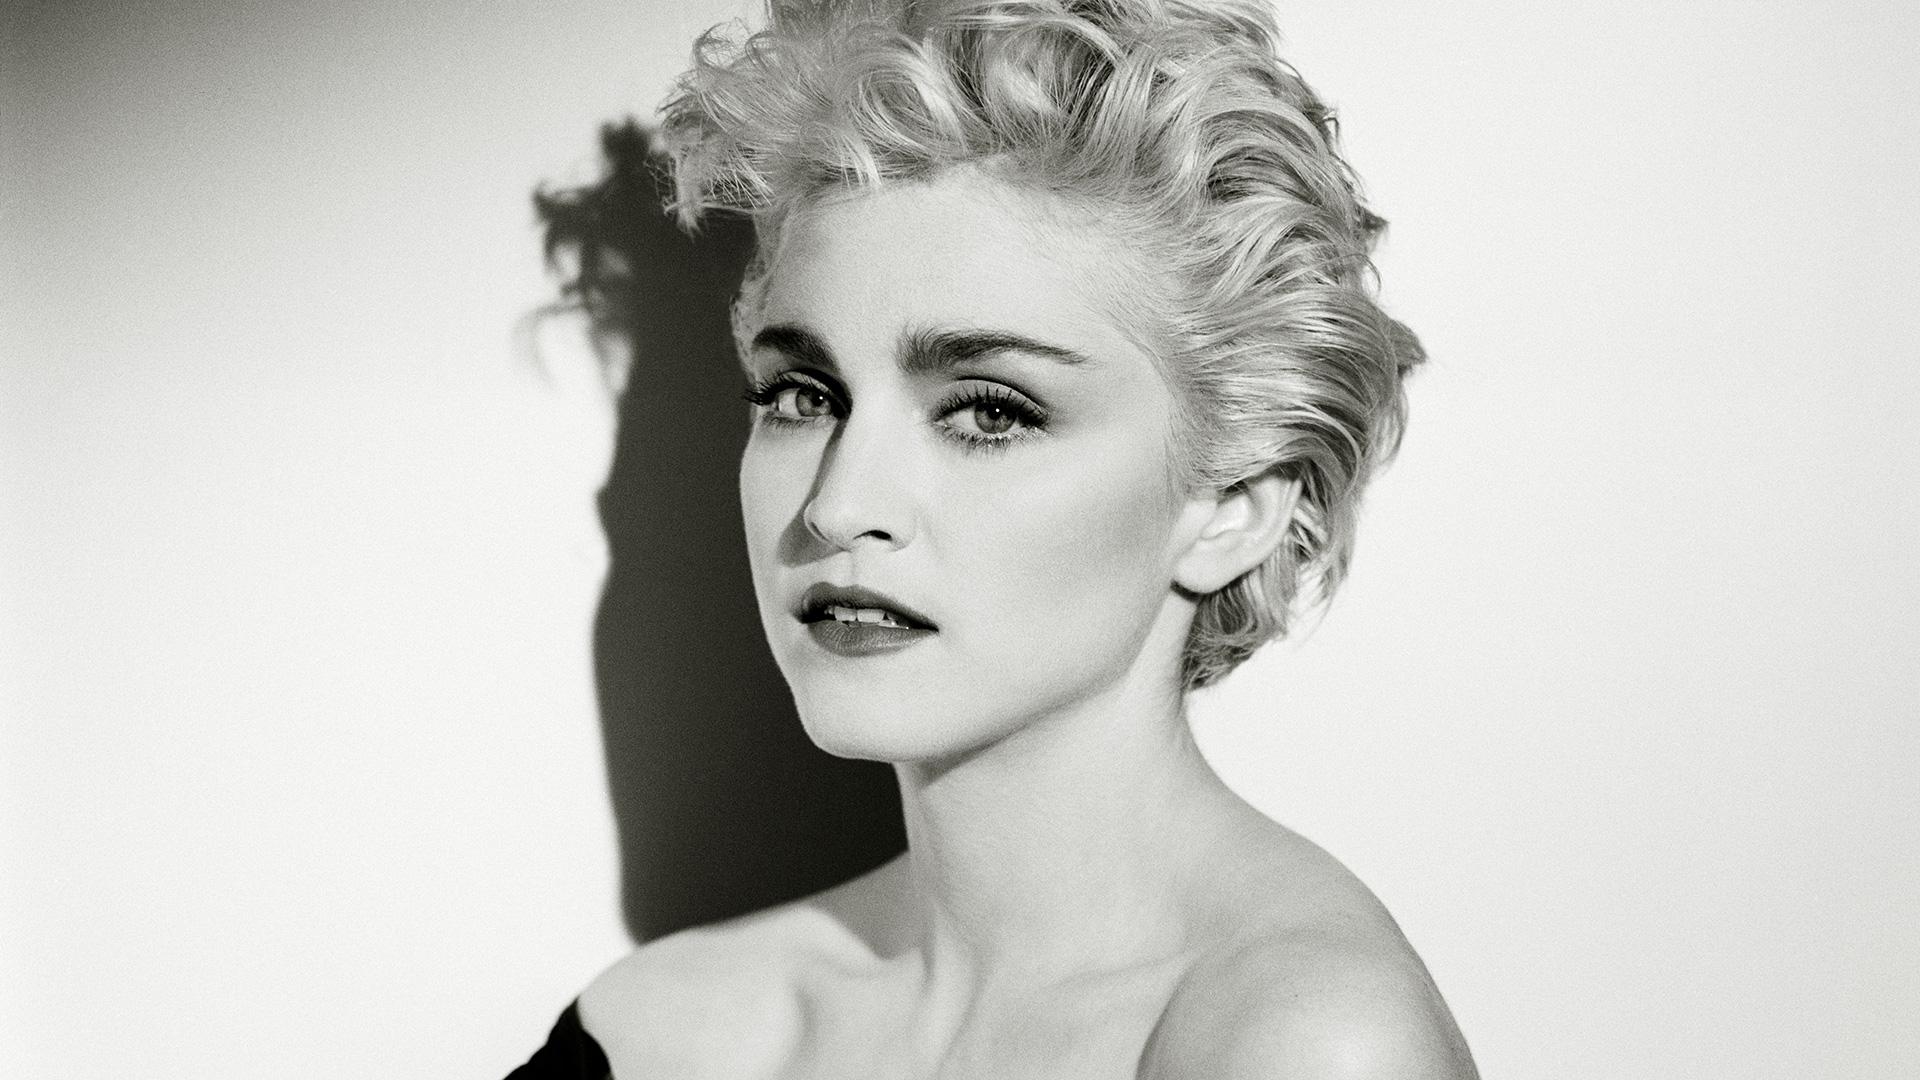 Madonna hd wallpaper background image 1920x1080 id 545511 wallpaper abyss - Madonna hd images ...